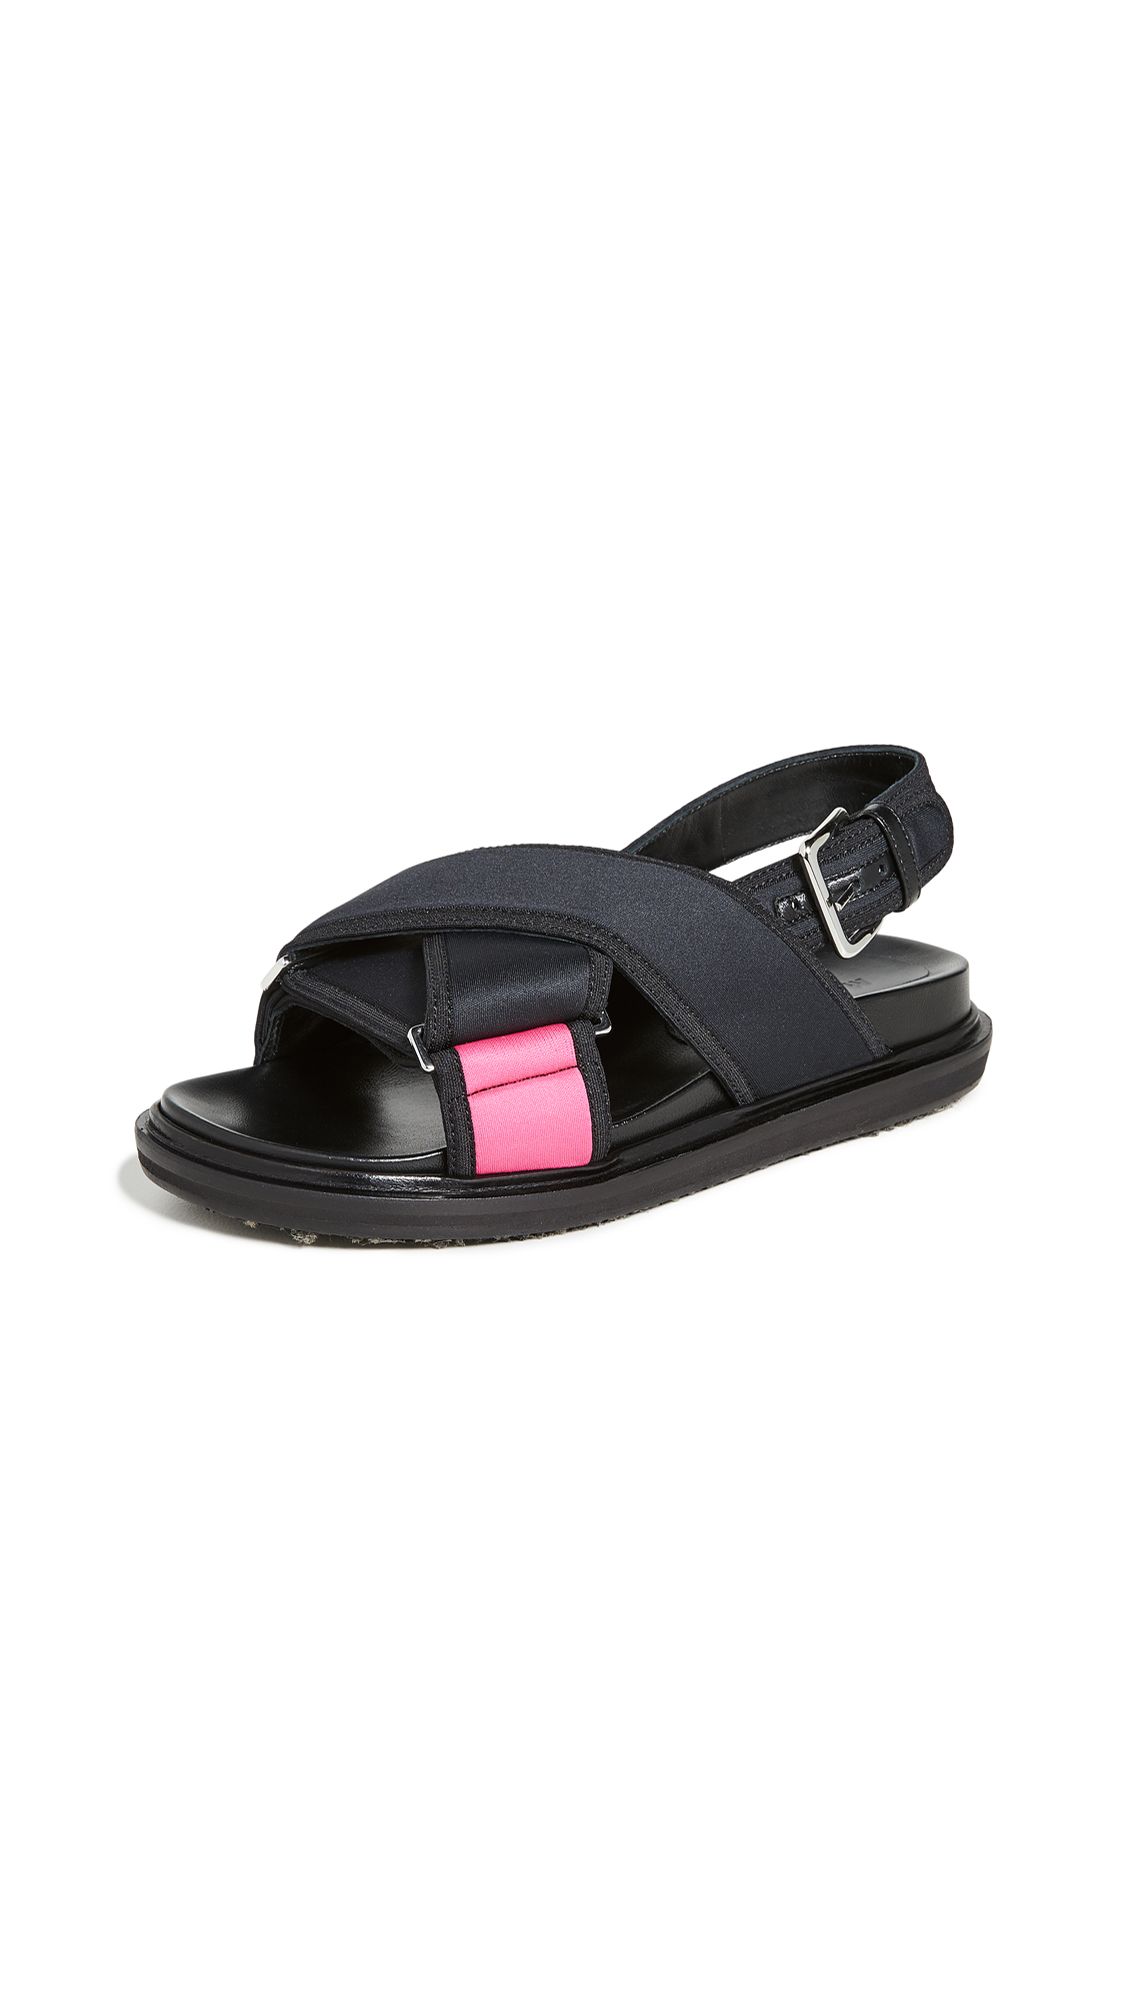 Buy Marni Crisscross Sandals online, shop Marni